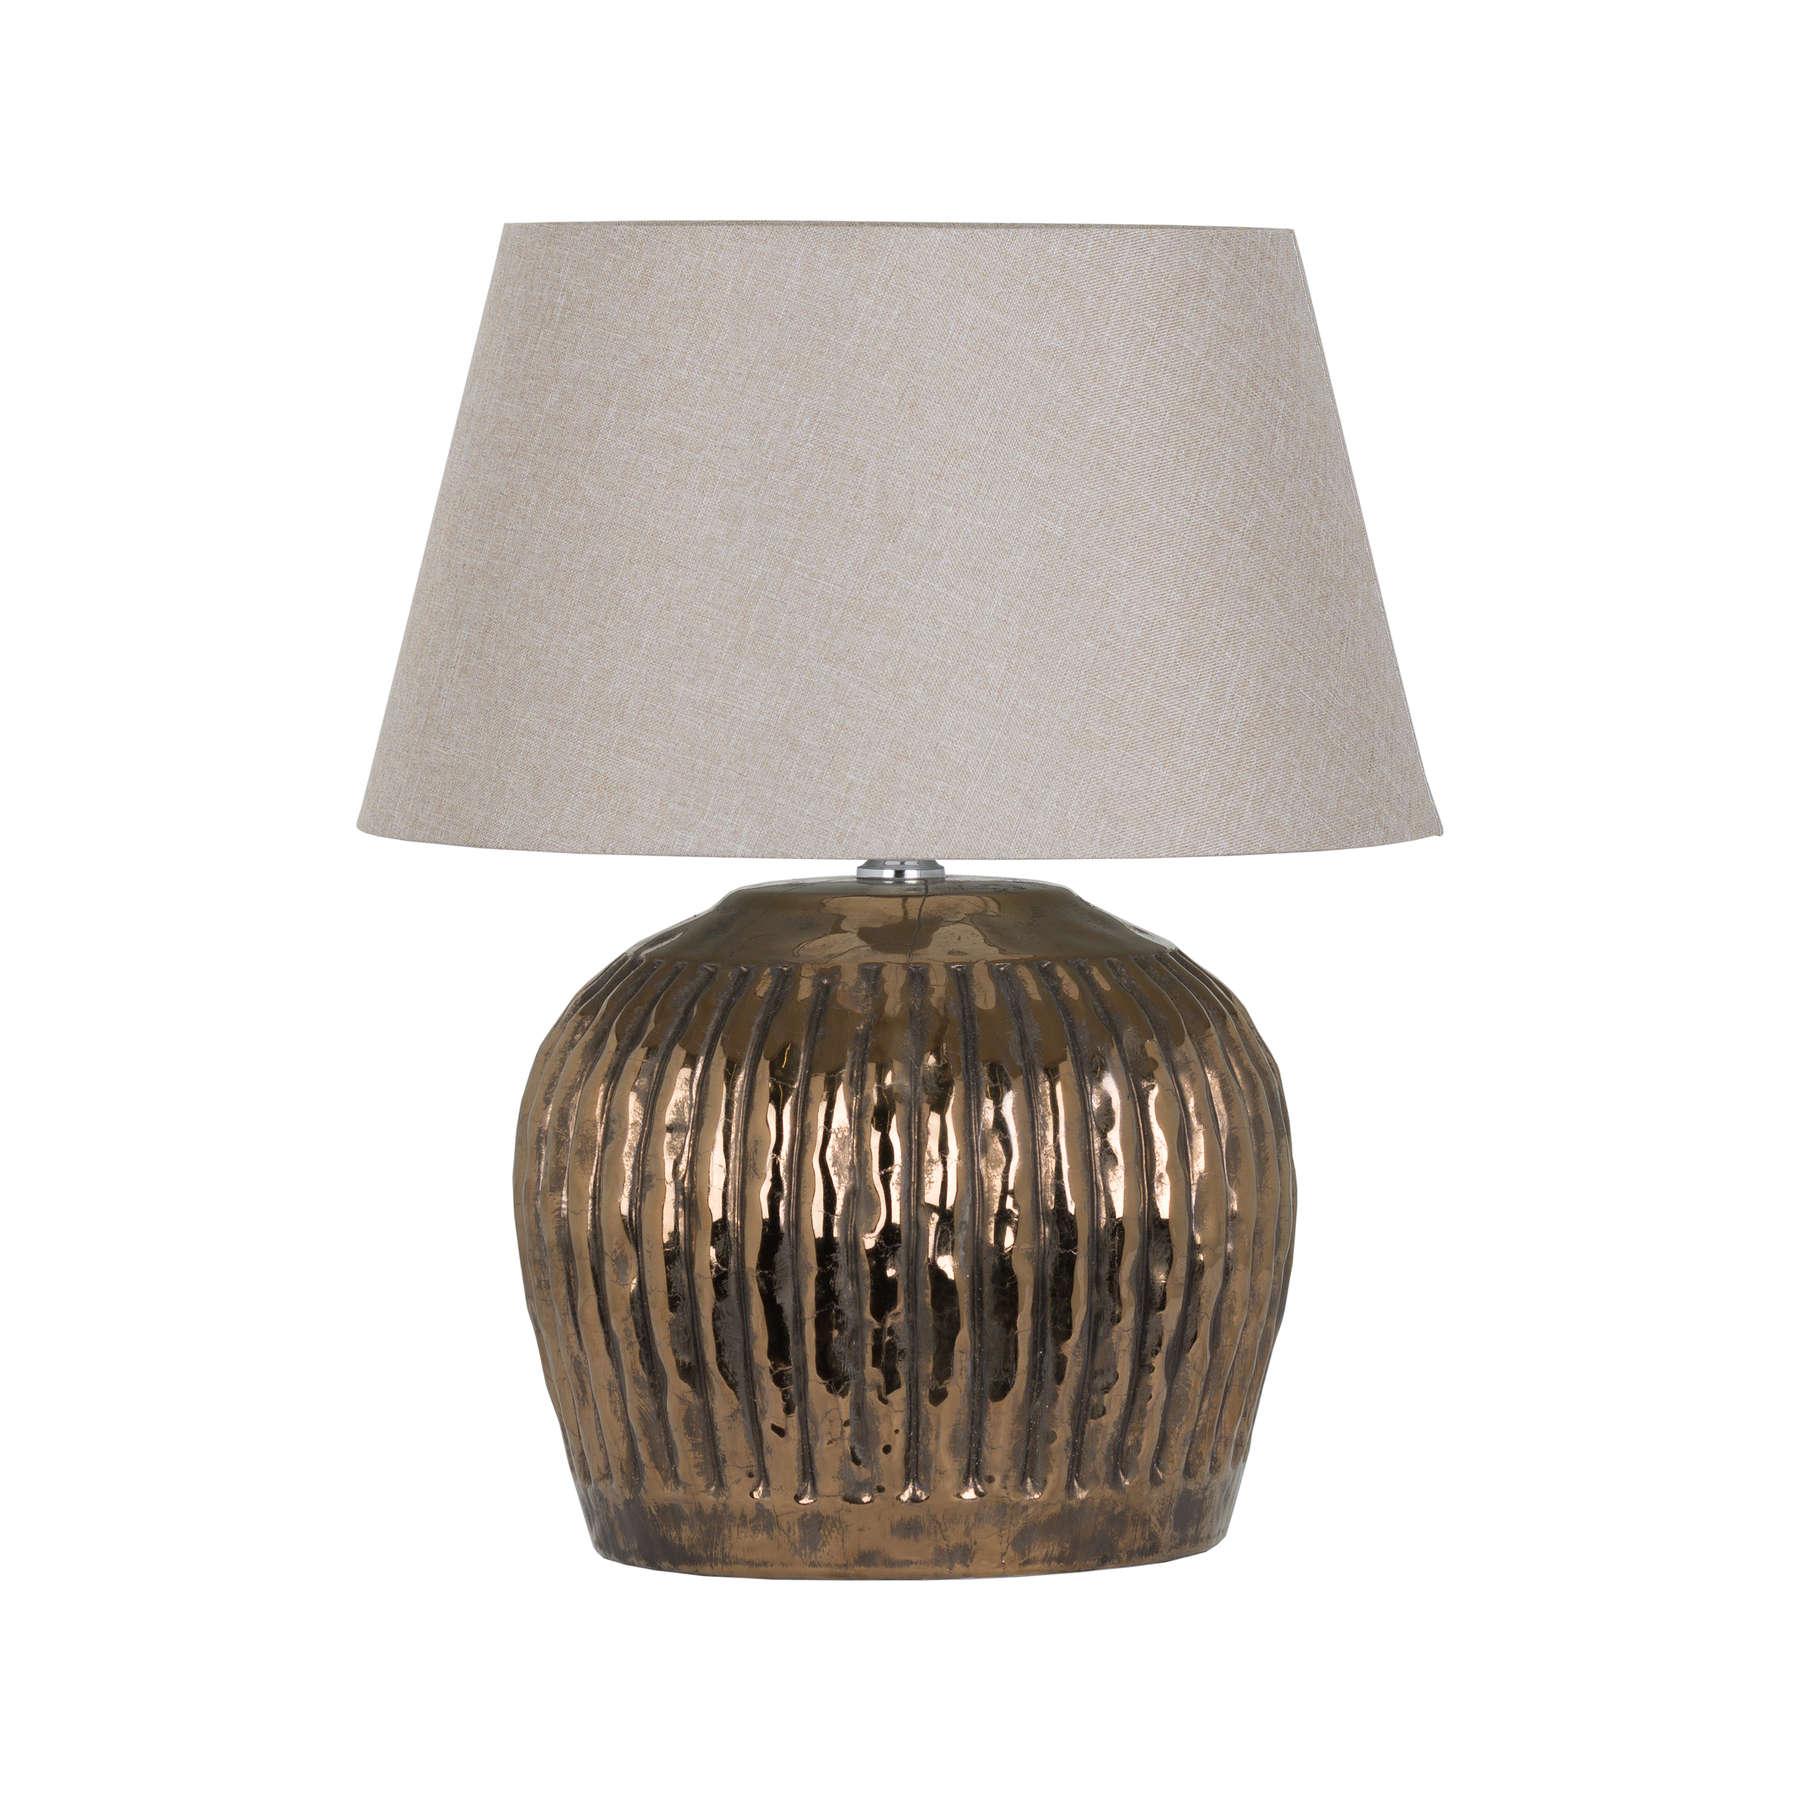 Basilica Bronze Metallic Ceramic Table Lamp